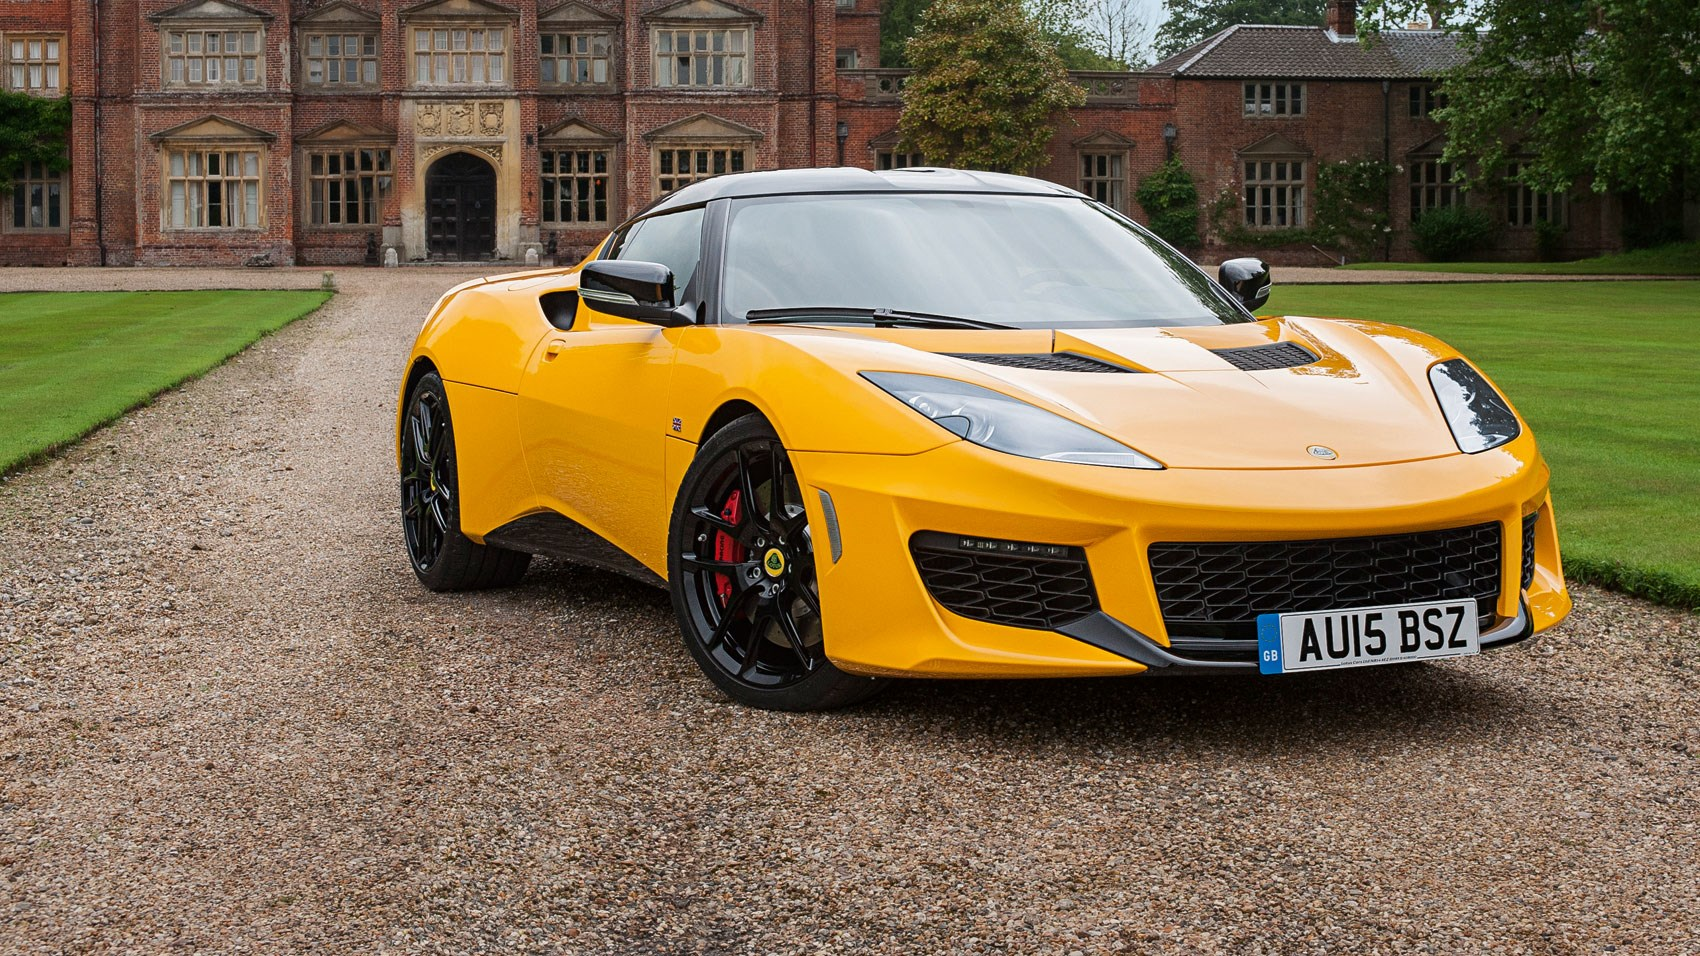 Lotus Evora 400 (2015) Review